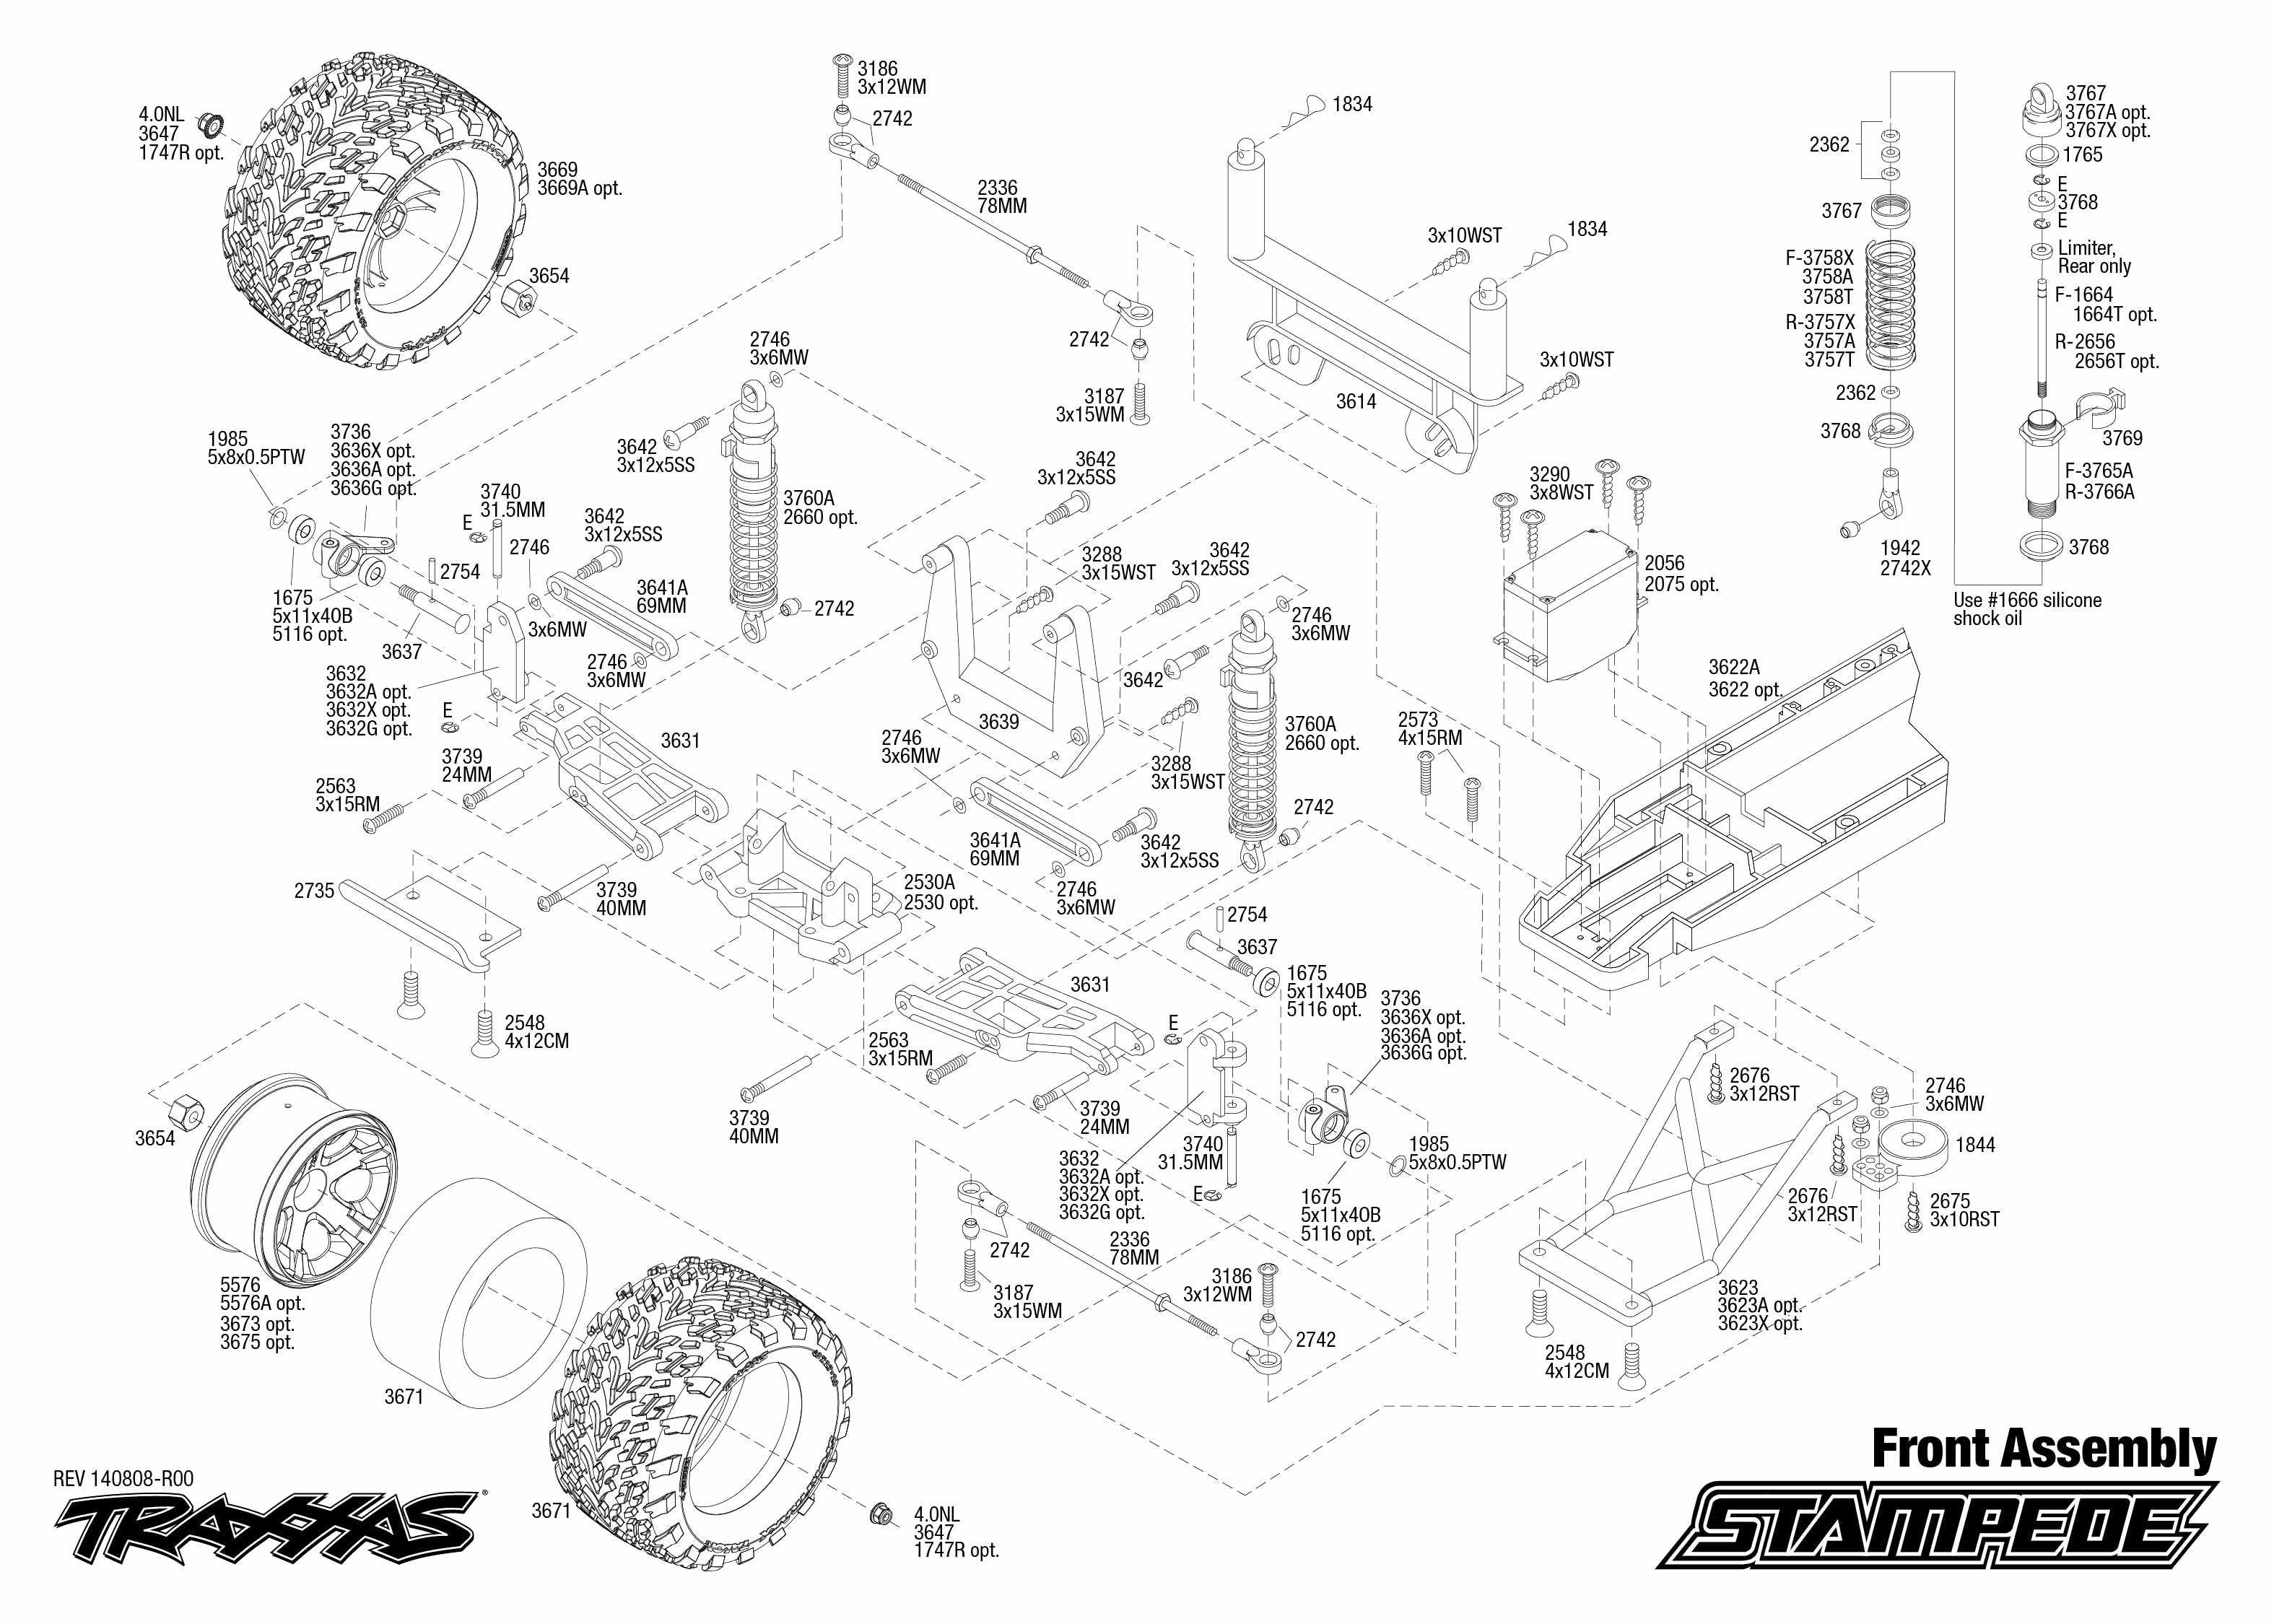 Revo Wiring Diagram Pete For 1990 Of Toyota Traxxas Parts Schematics Diagrams Front Diagramhtml